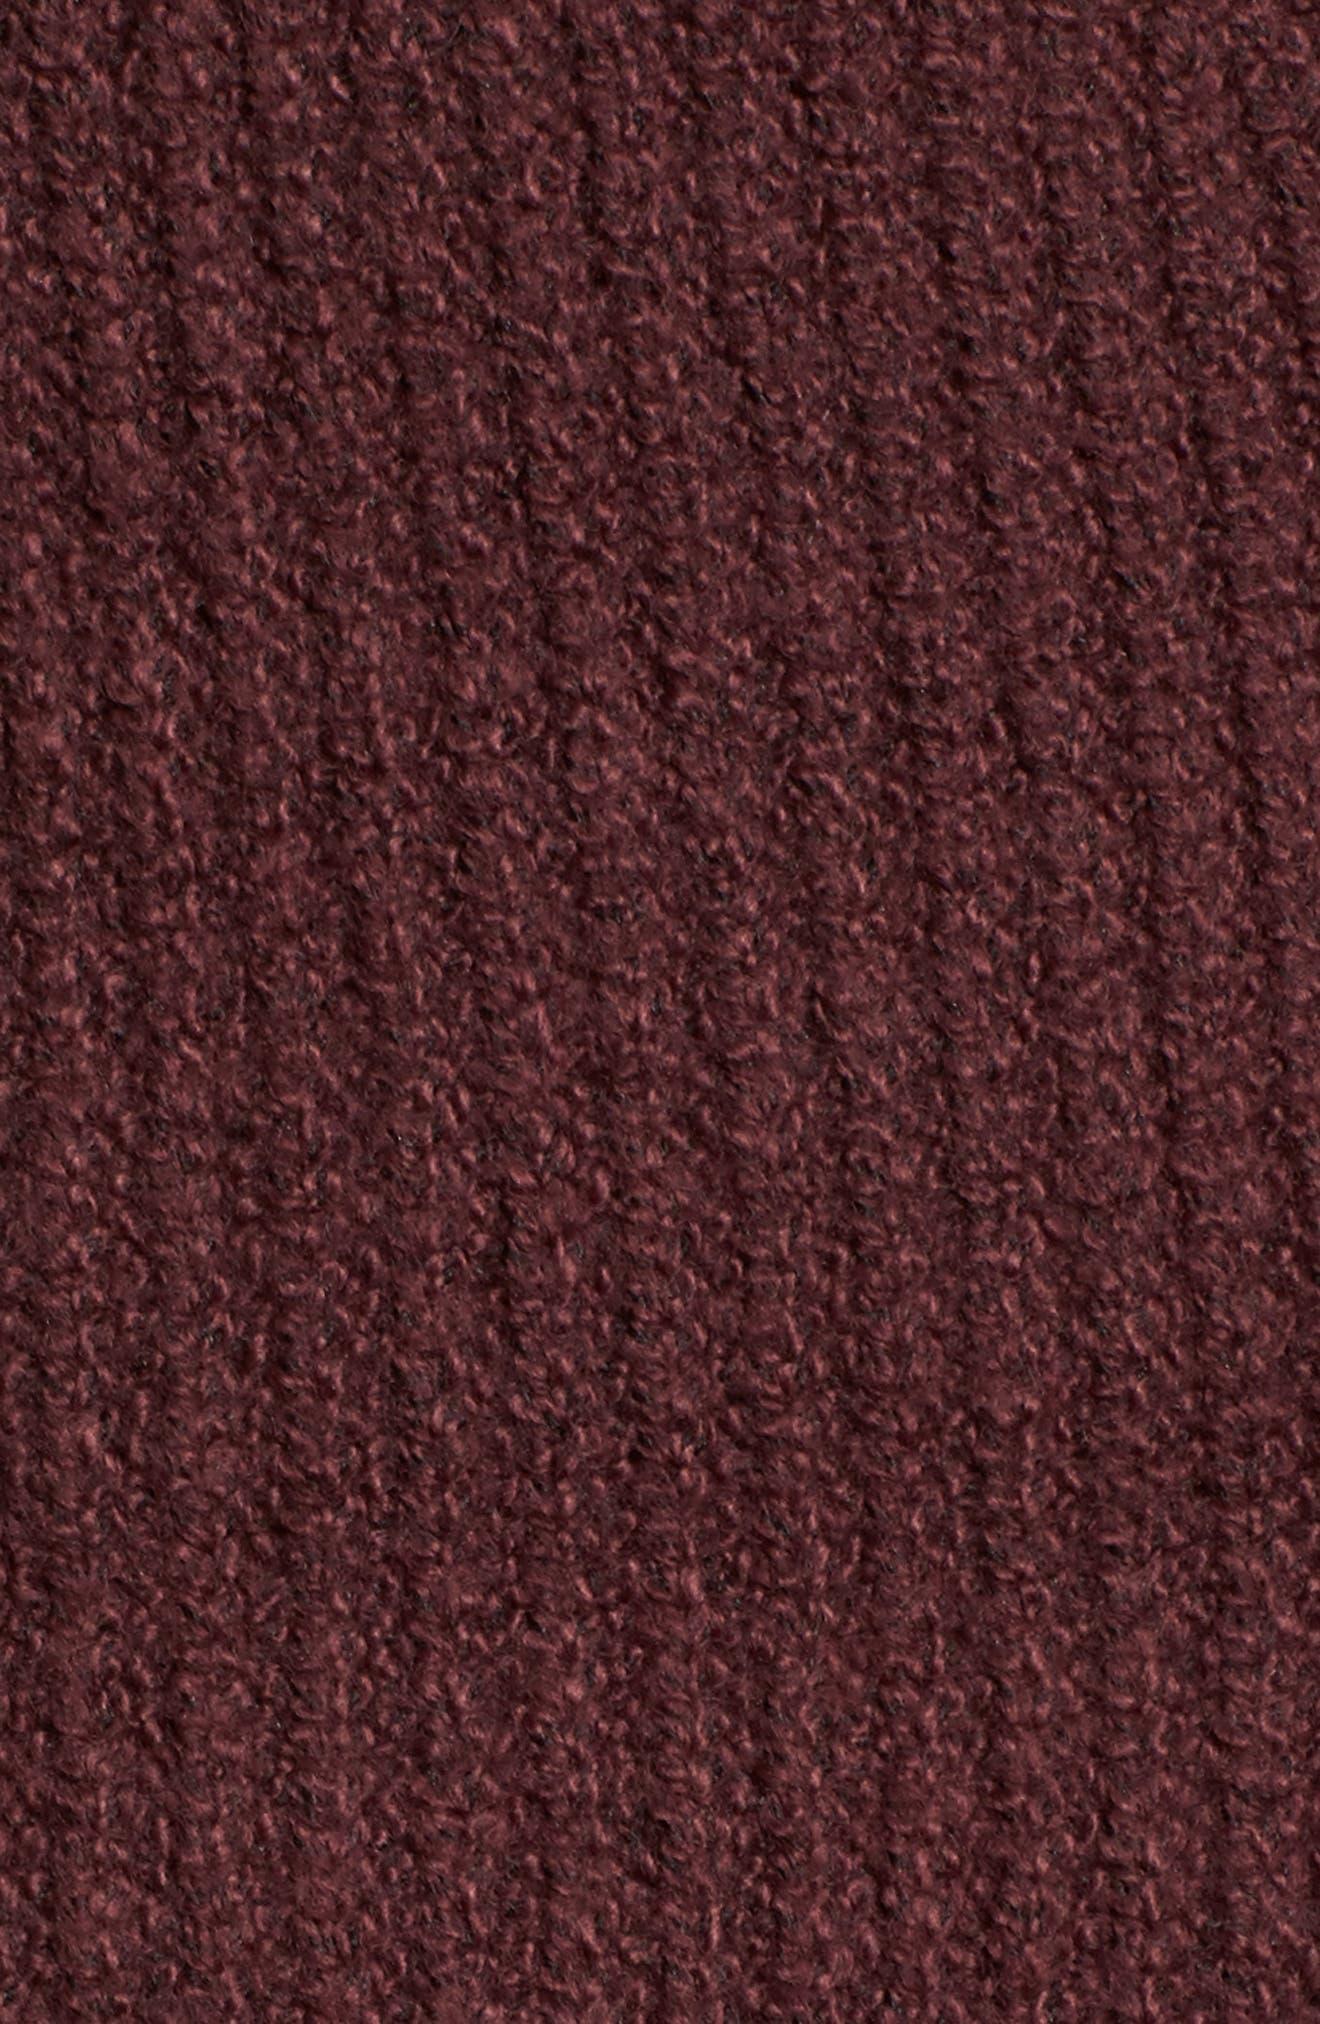 Ribbed Cardigan Sweater,                             Alternate thumbnail 5, color,                             930